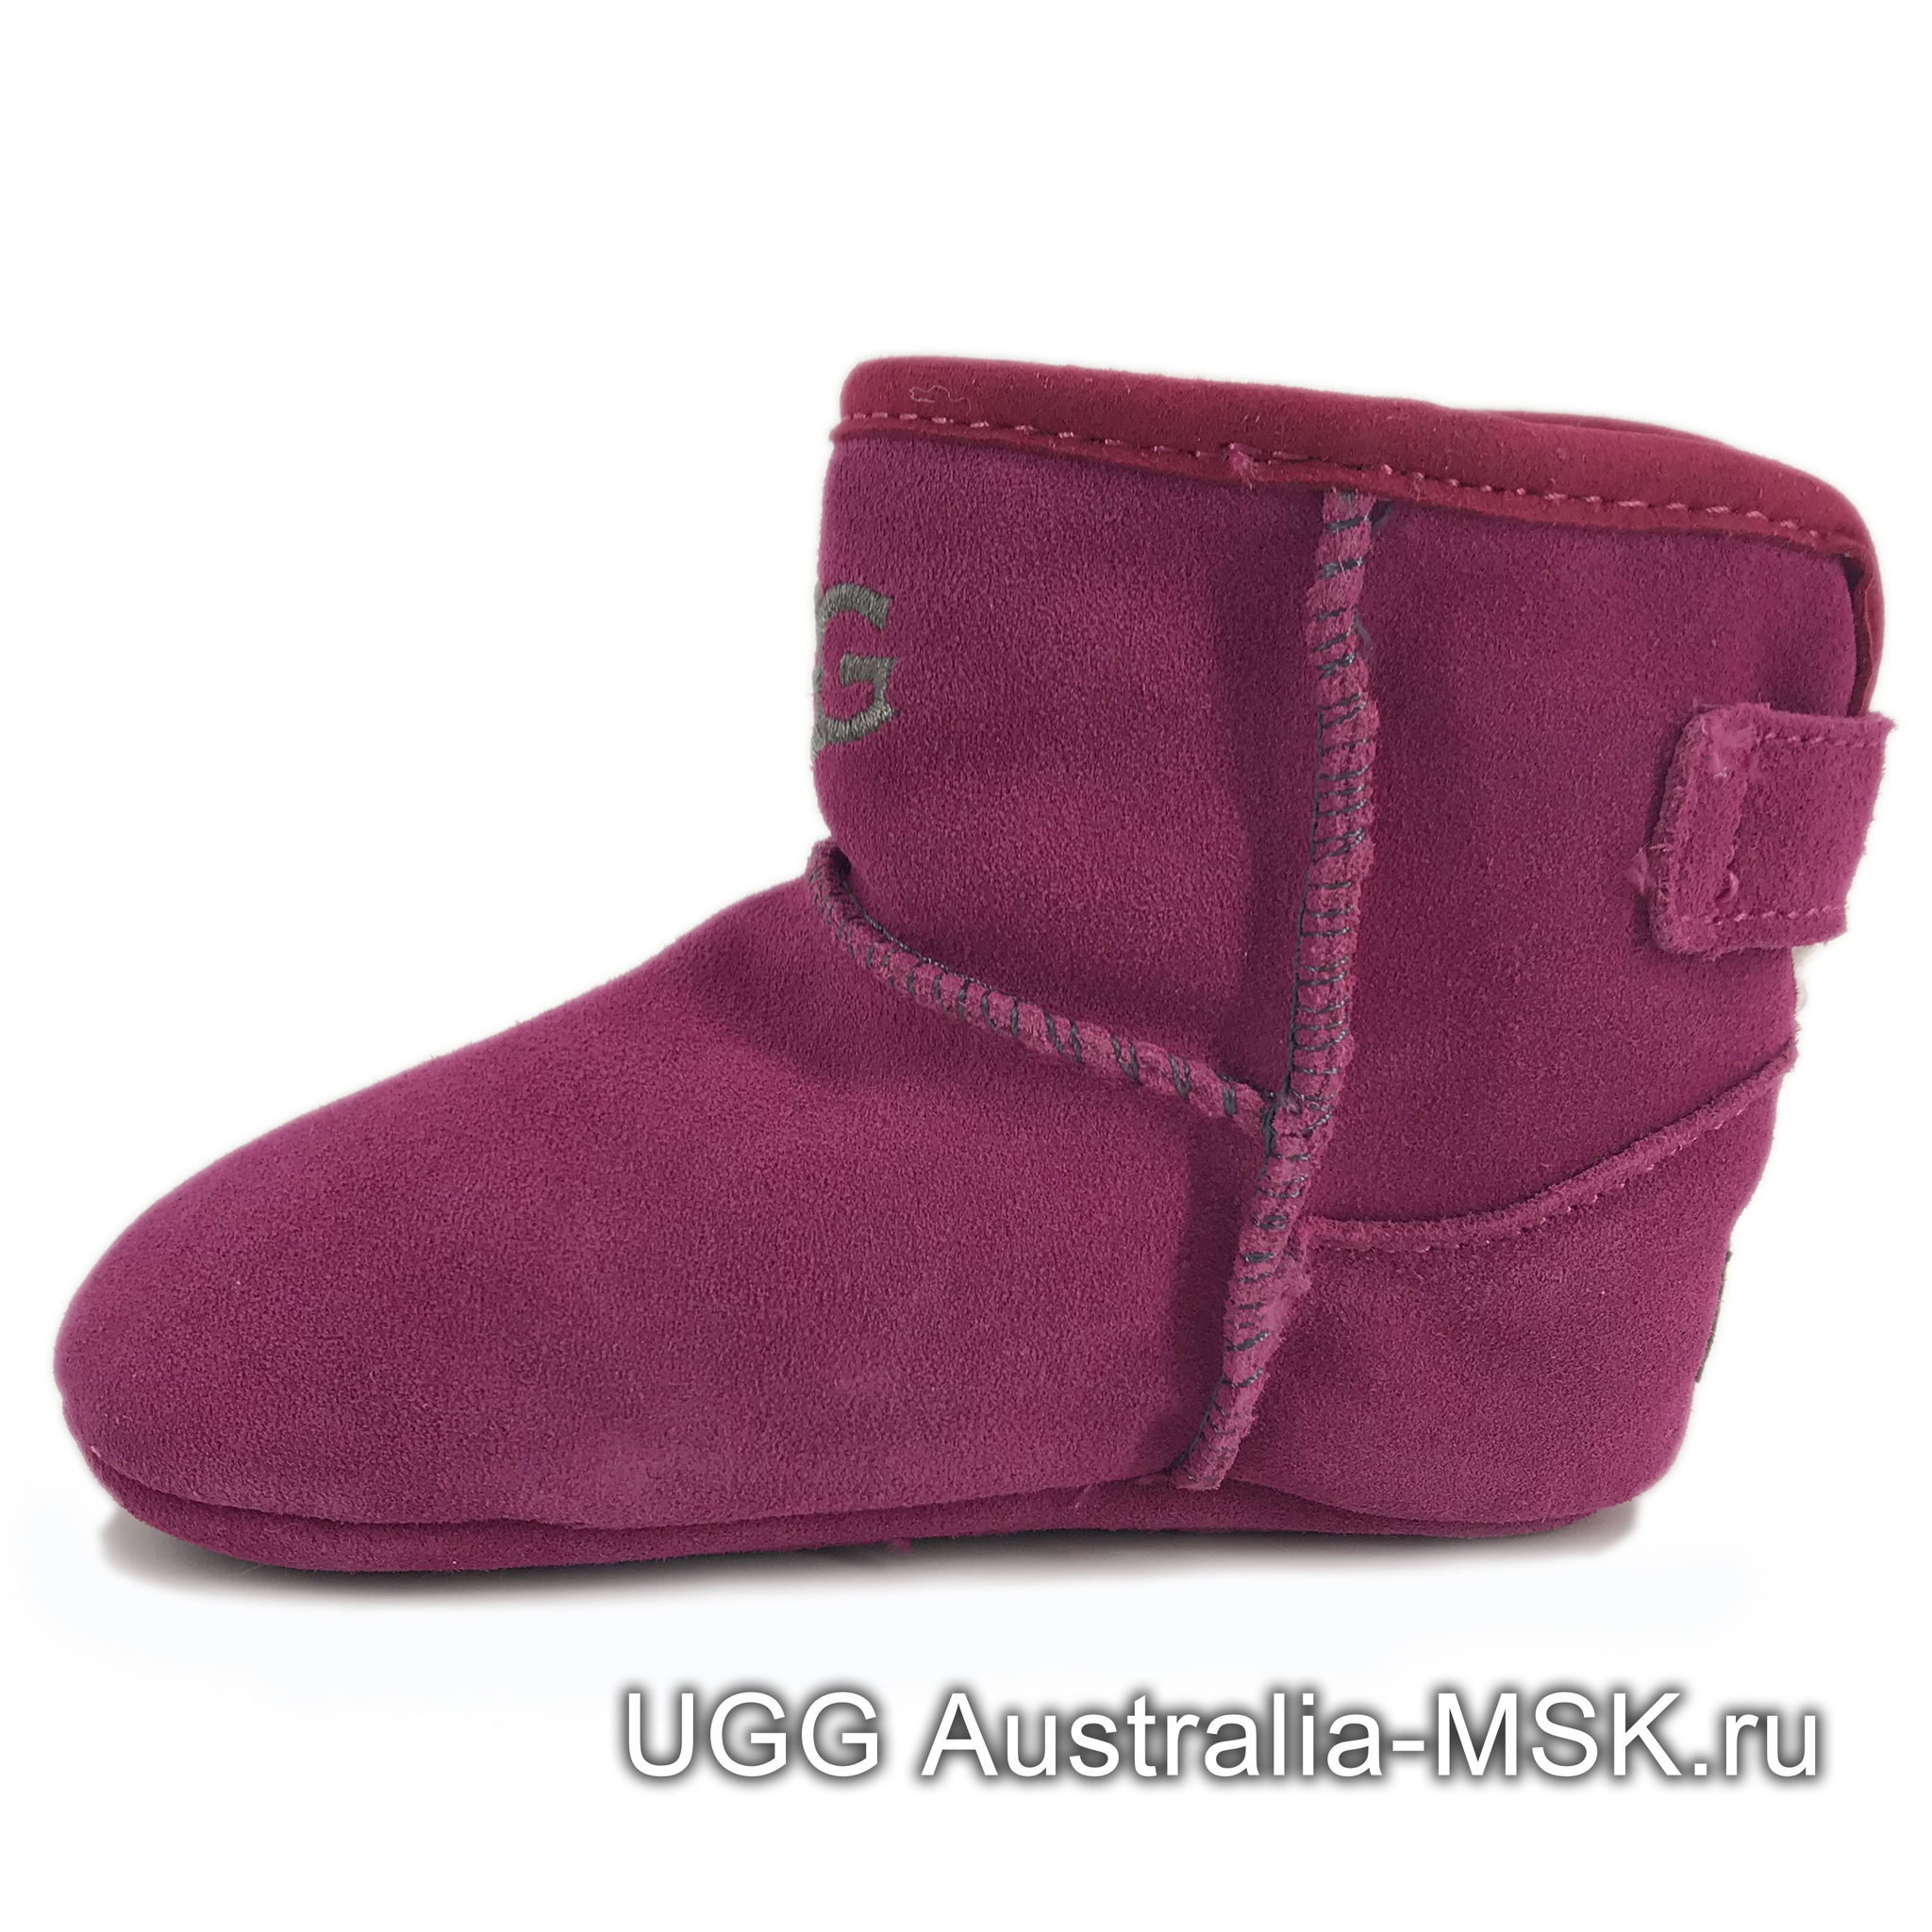 Пинетки Jesse UGG Dark Pink